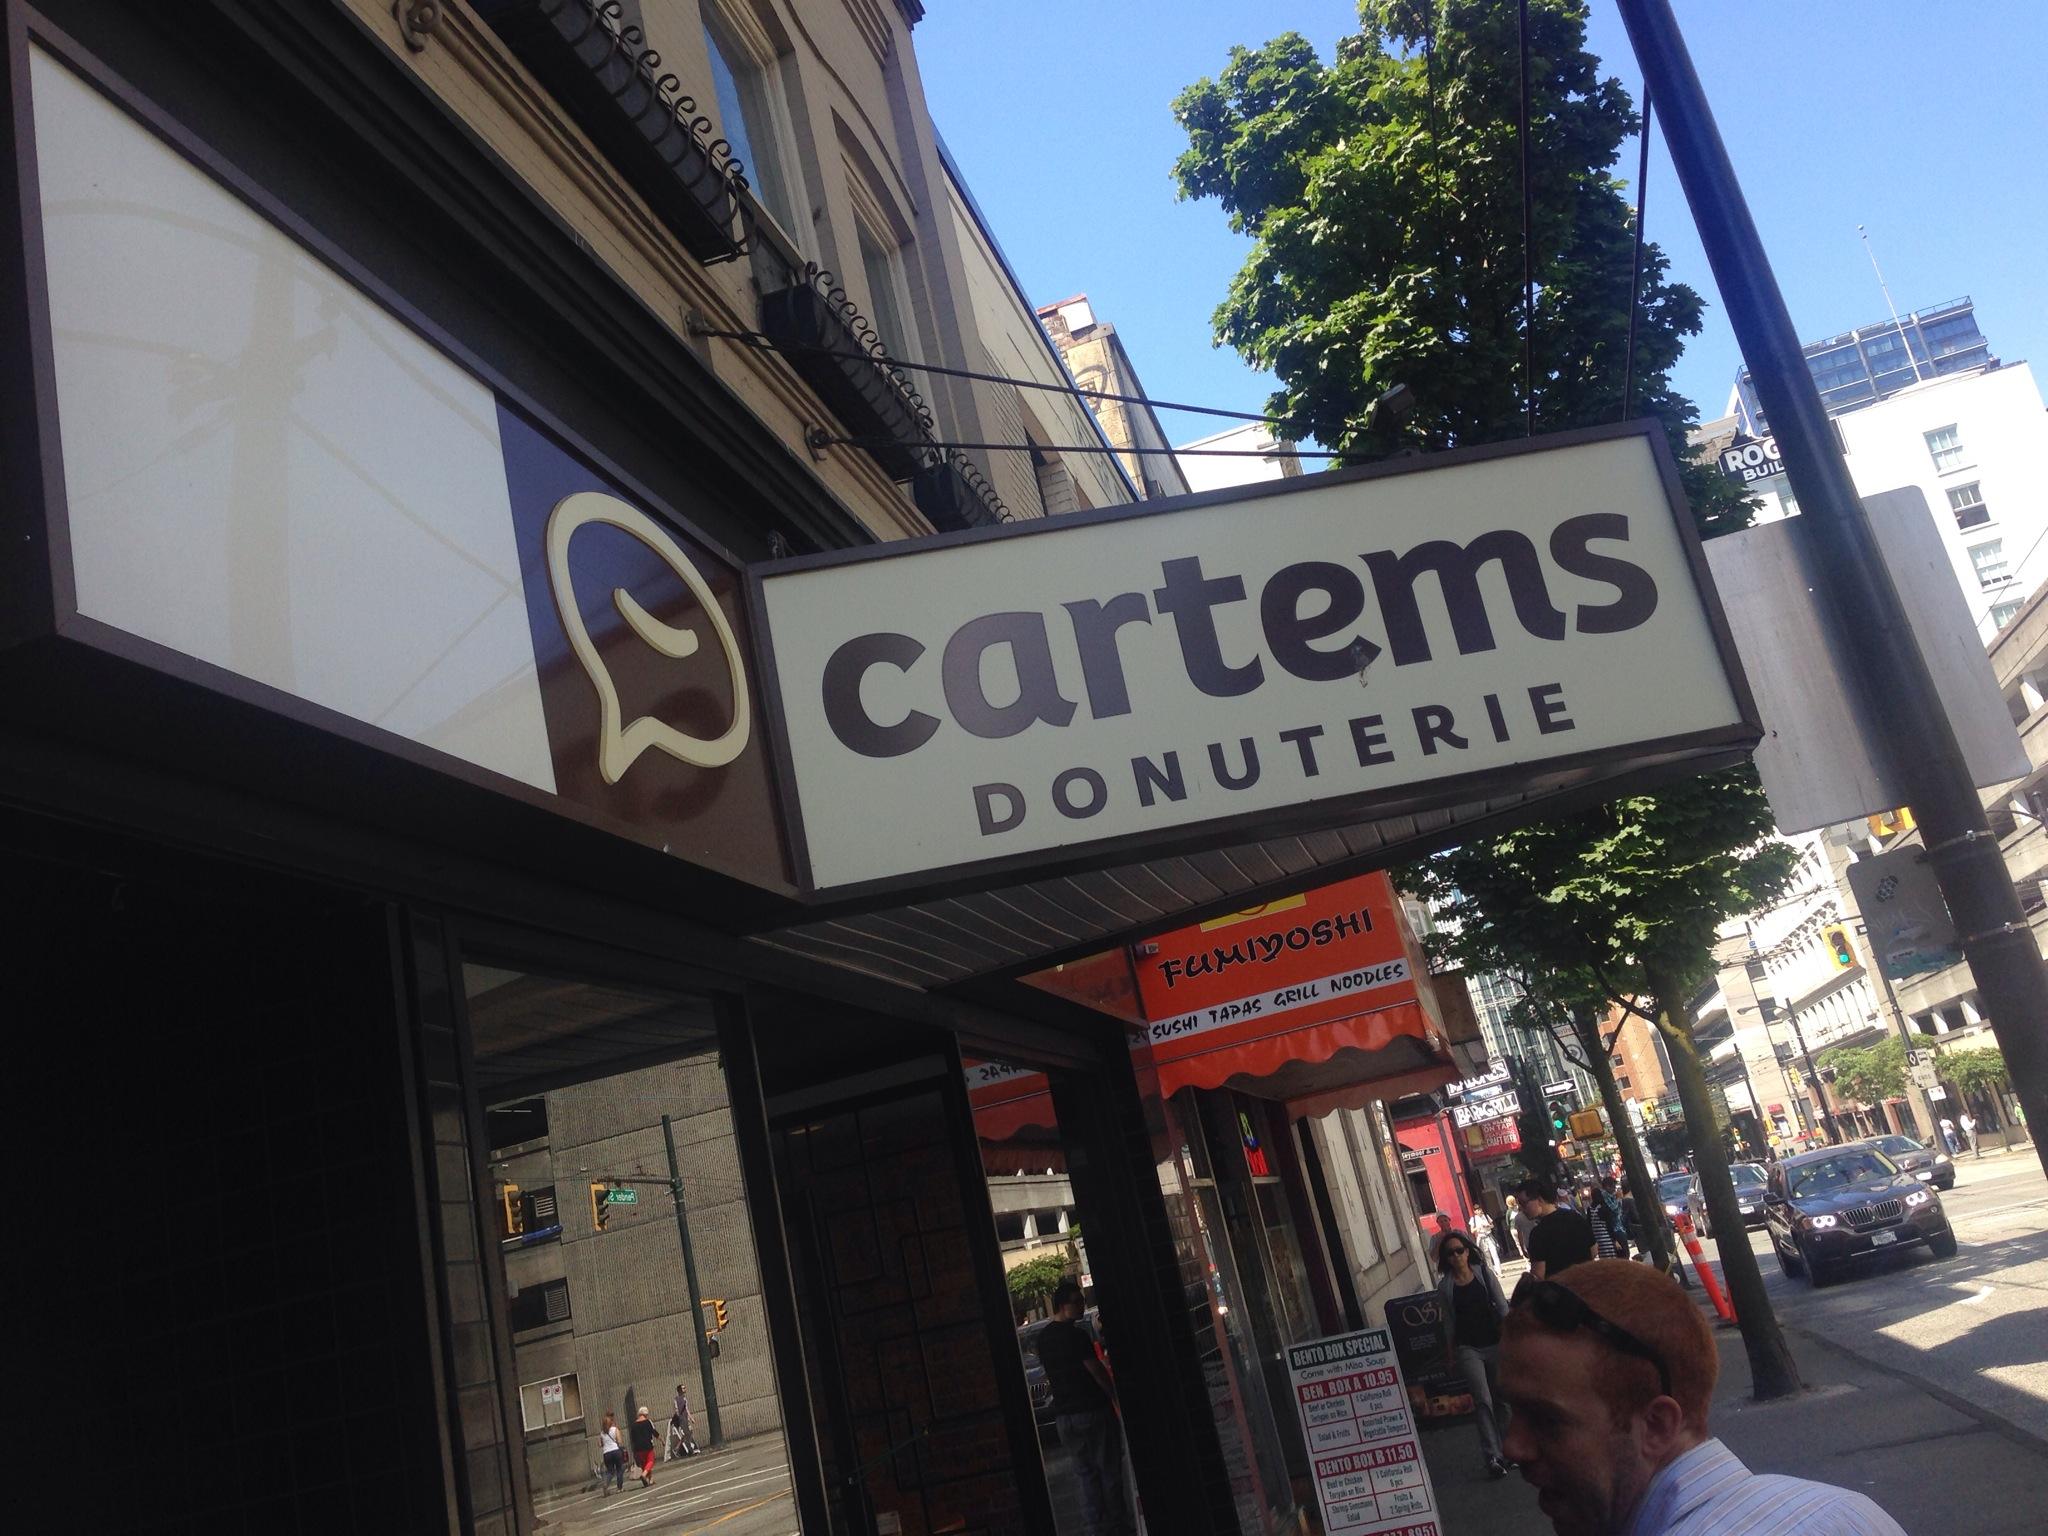 Cartems Donuterie